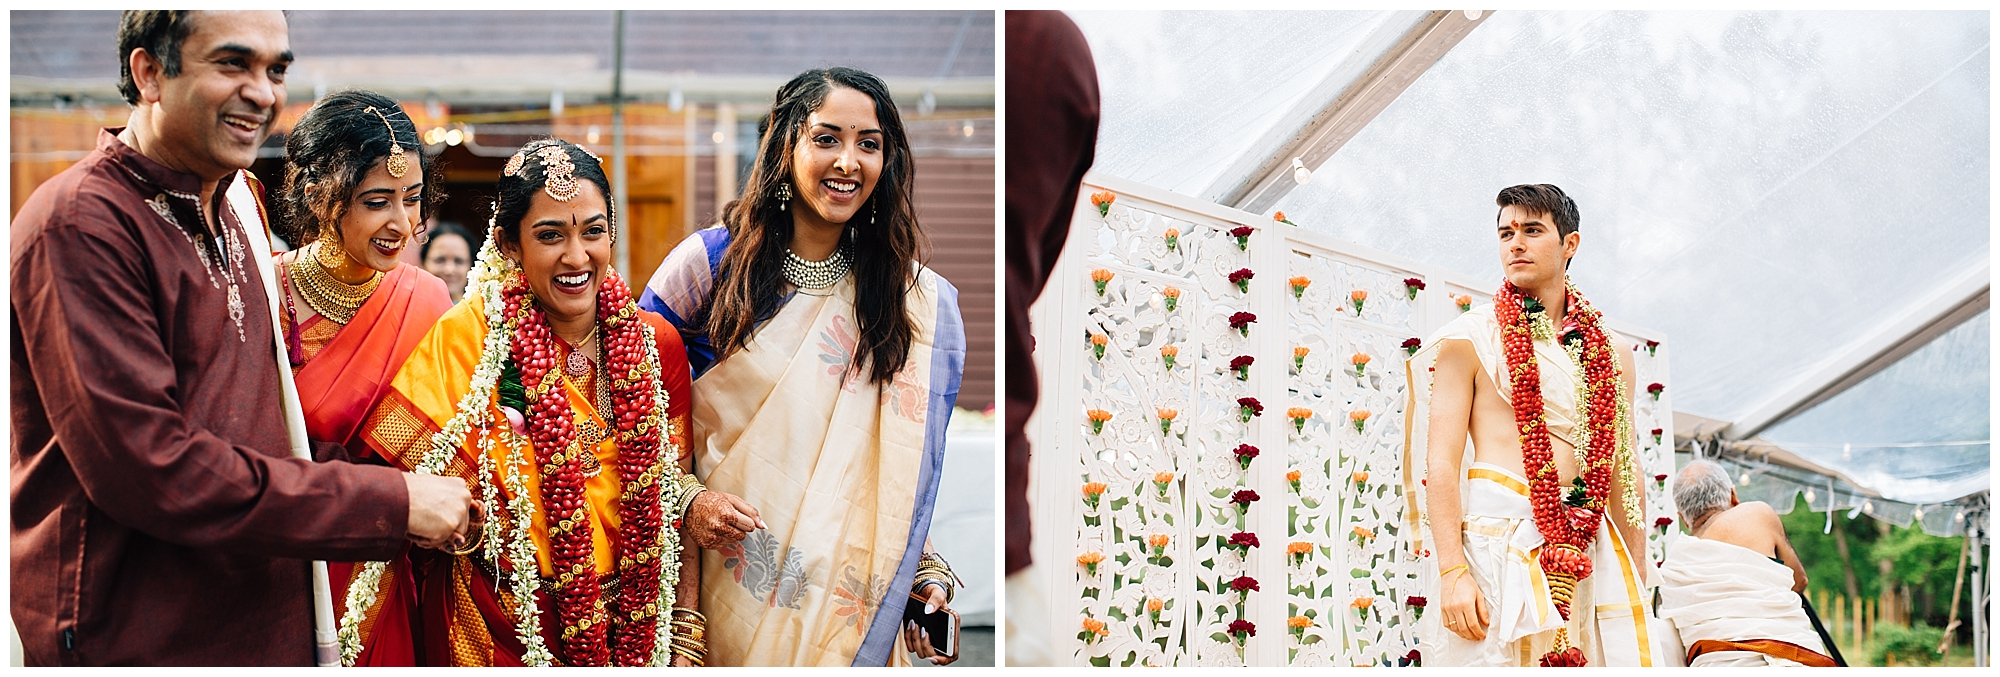 Indian-Wedding-Photographer-Raleigh-54.jpg